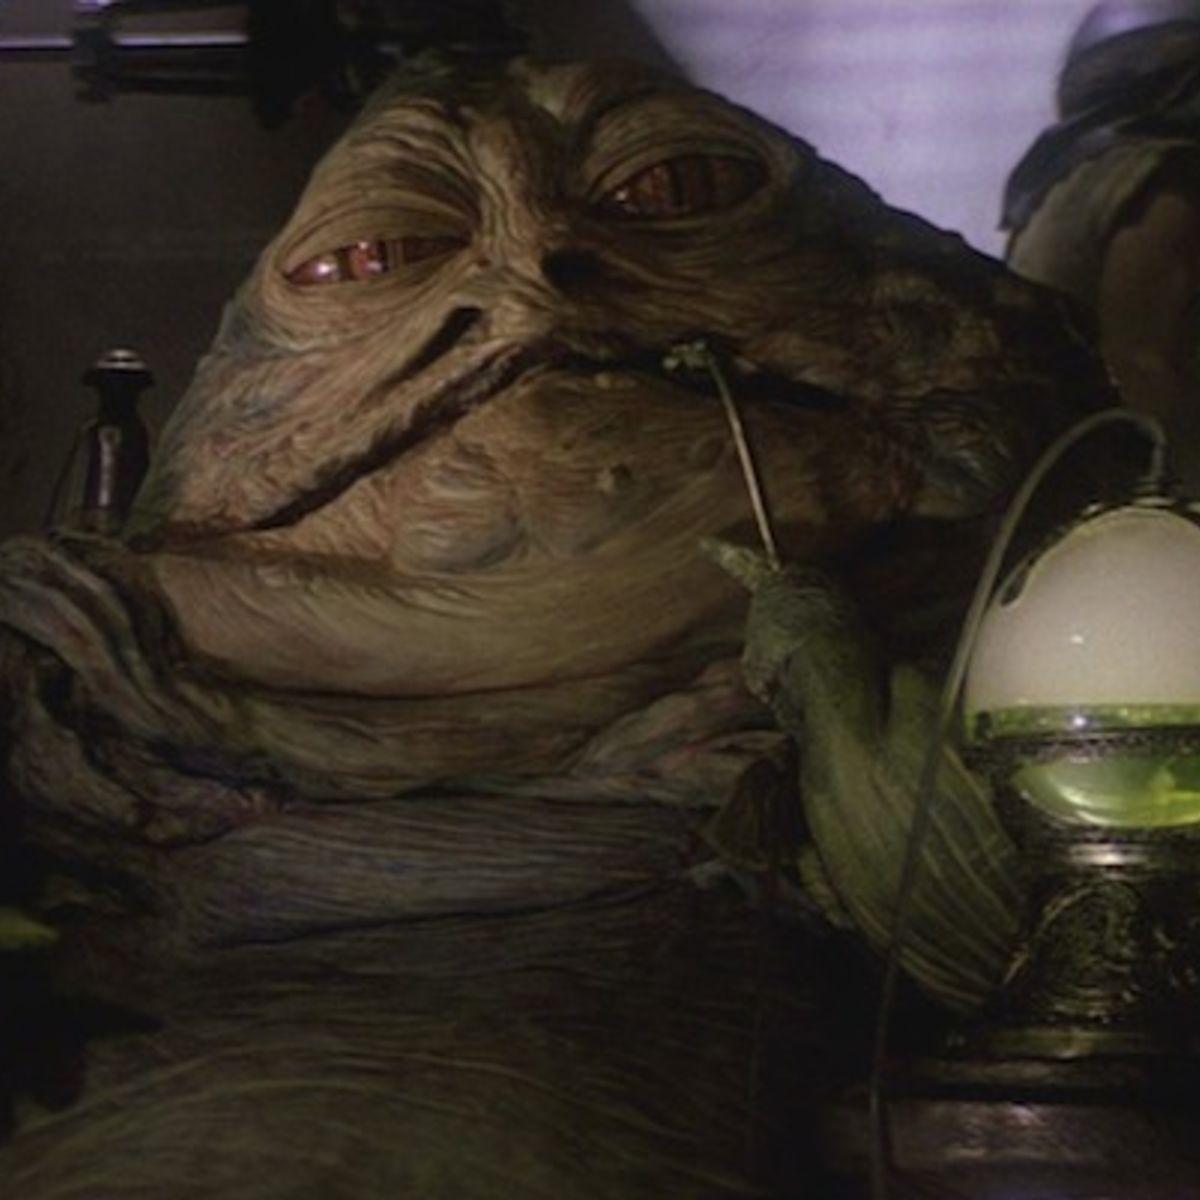 Jabba_the_hutt_0.jpeg